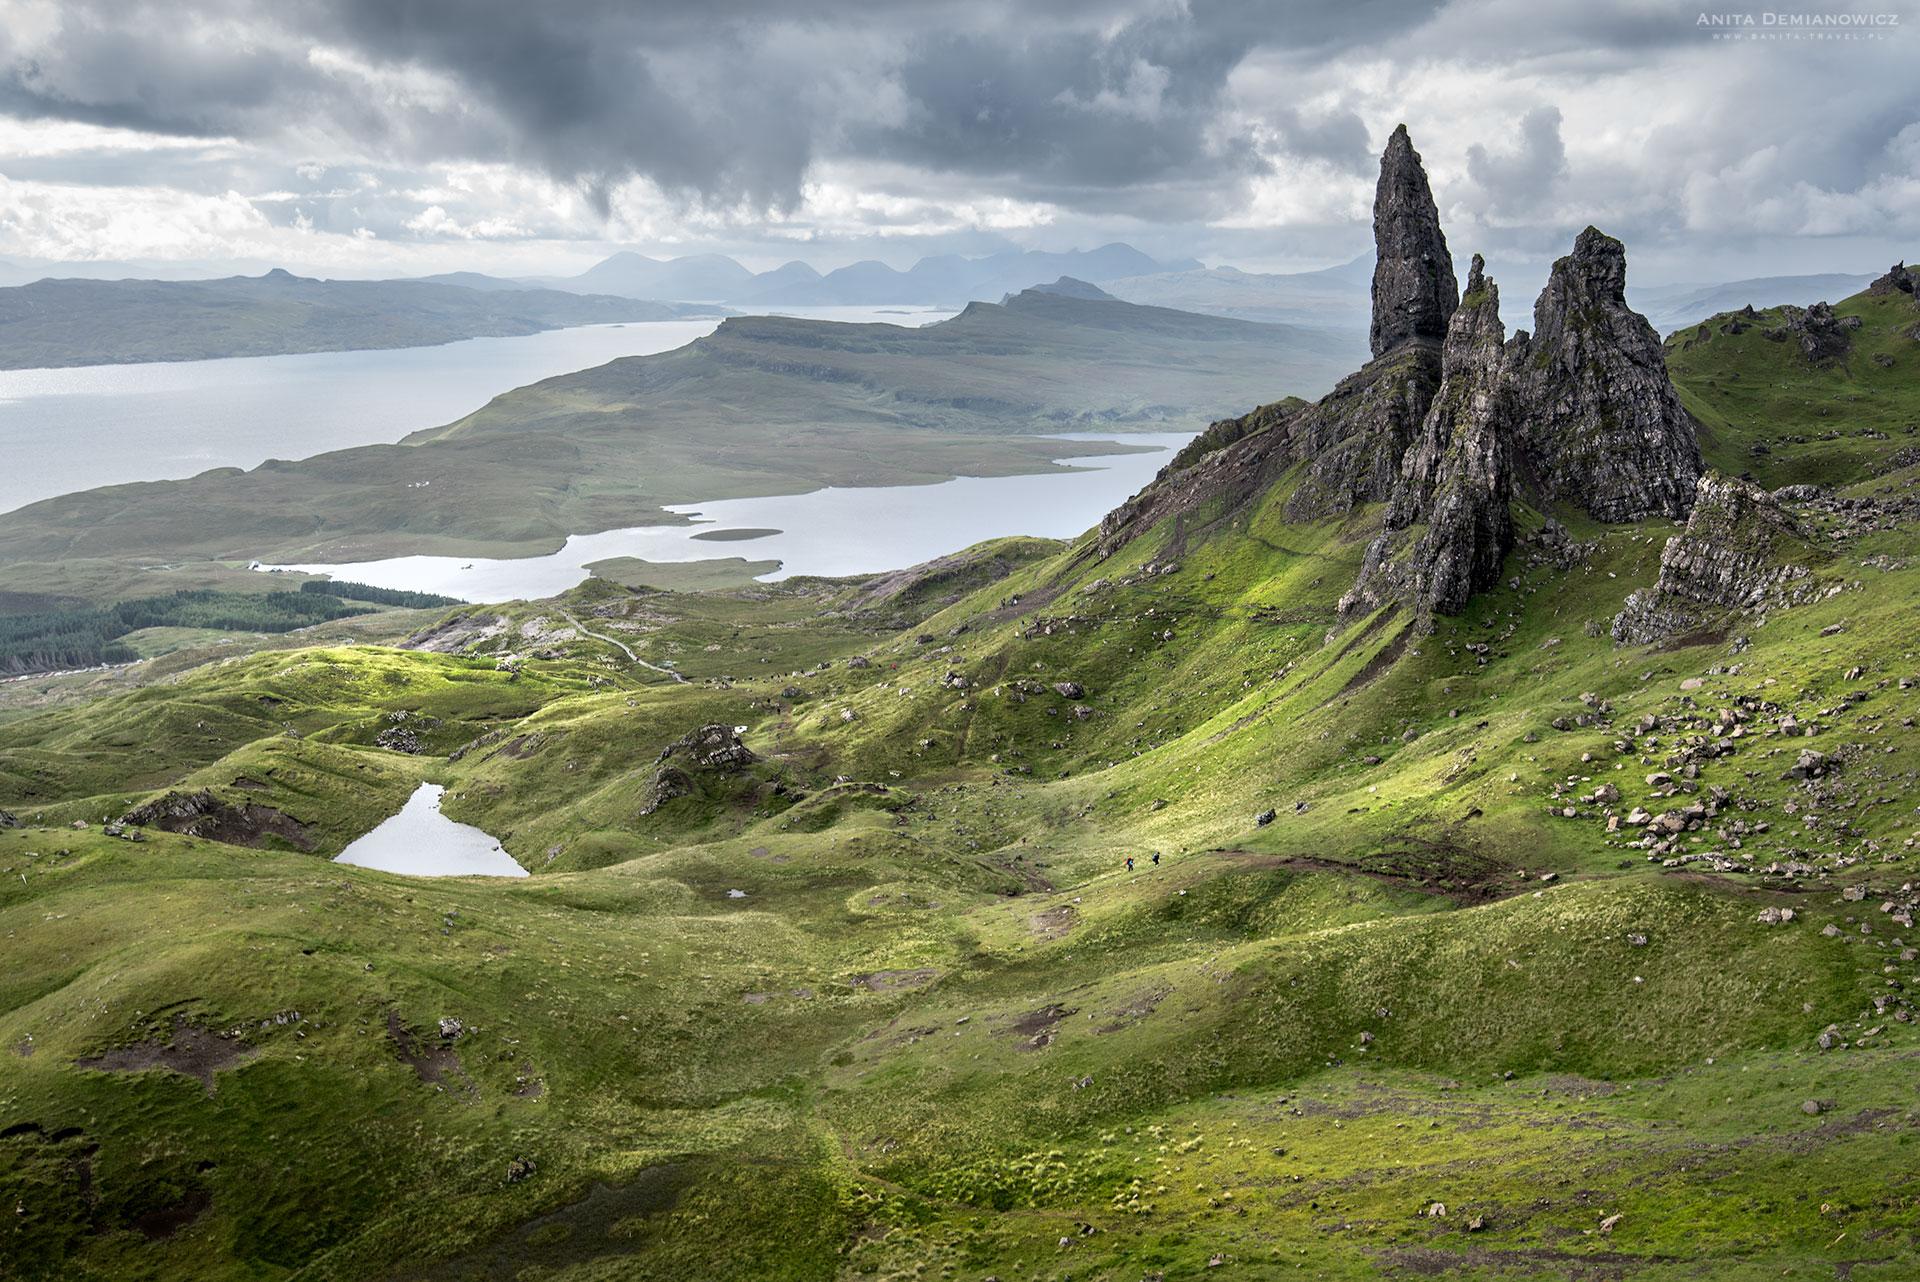 Old-Man-of-Storr, Szkocja, Isle of Skye